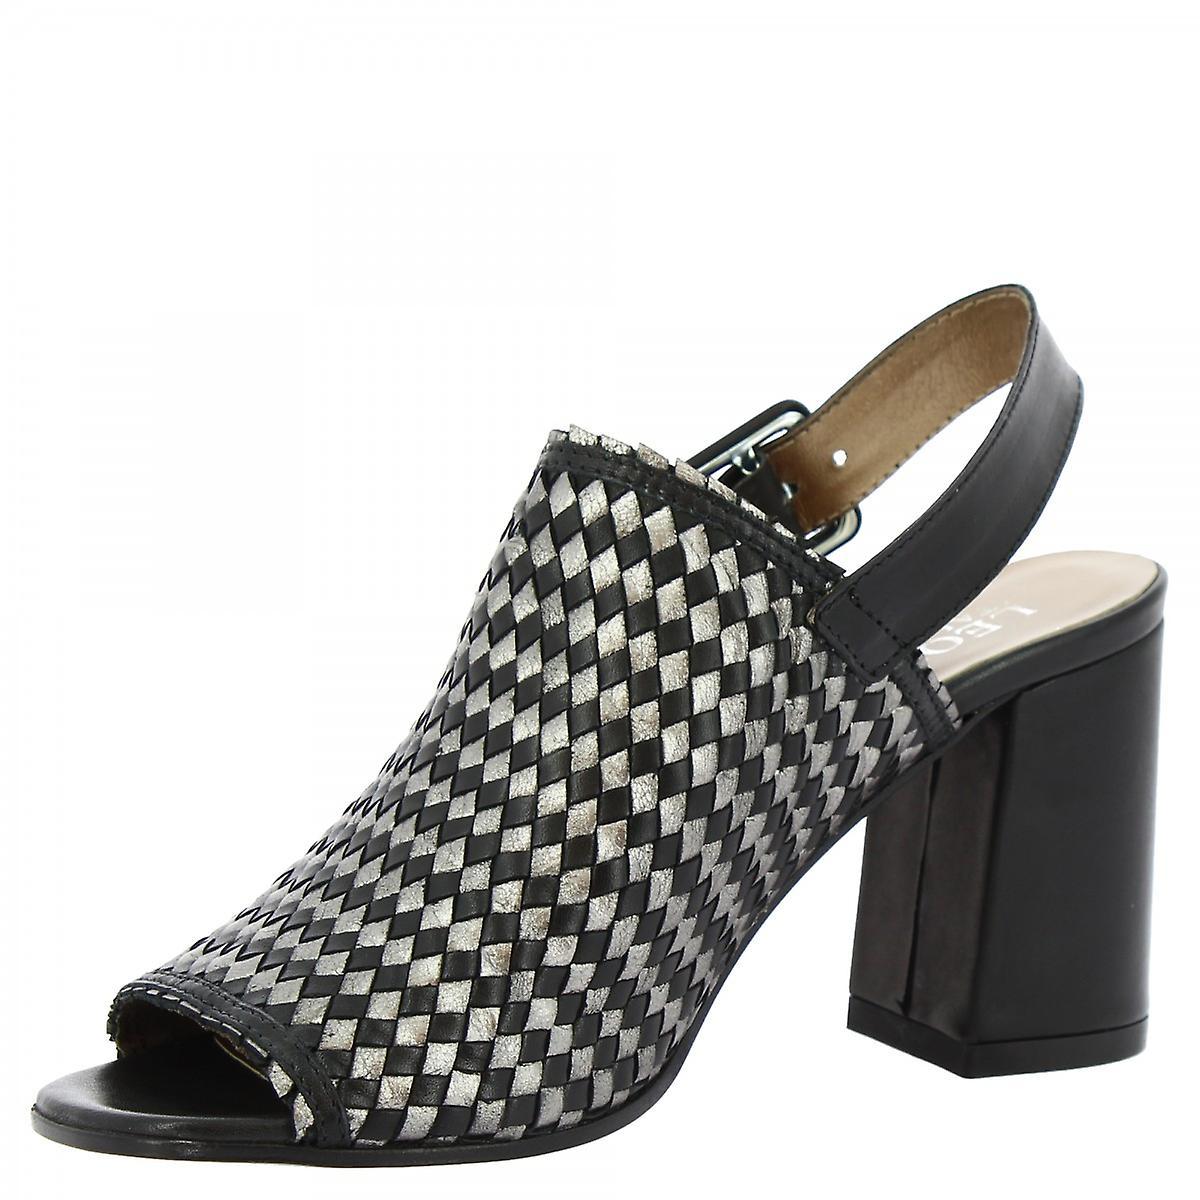 Leonardo Shoes Women's handmade slingback heel sandals black woven calf buckle 7FGOM